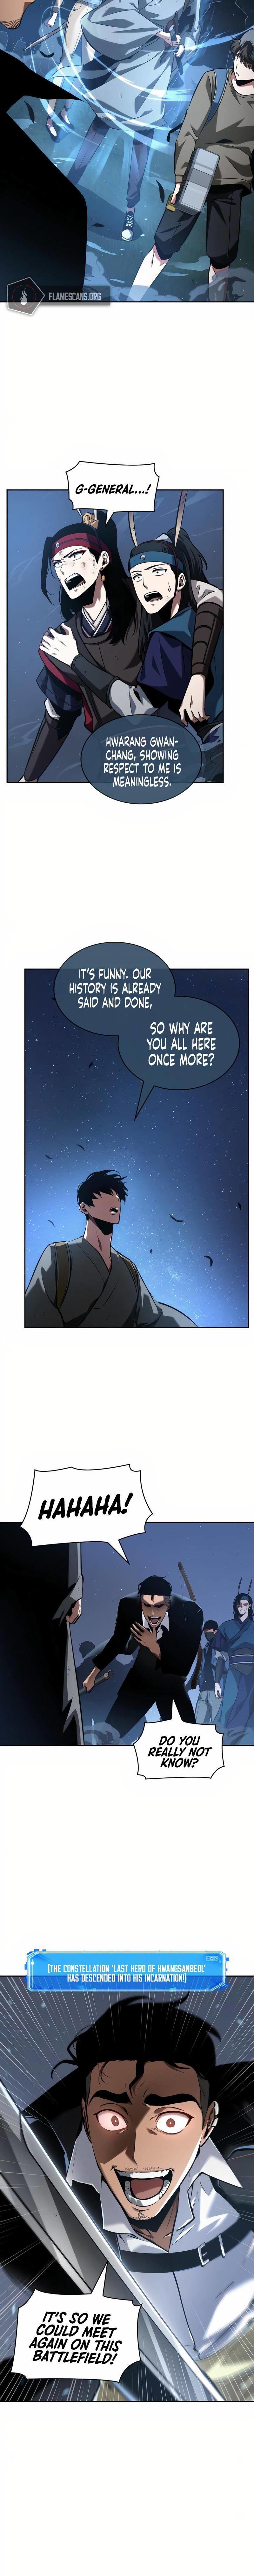 Omniscient Reader'S Viewpoint Chapter 60 page 5 - Mangakakalots.com